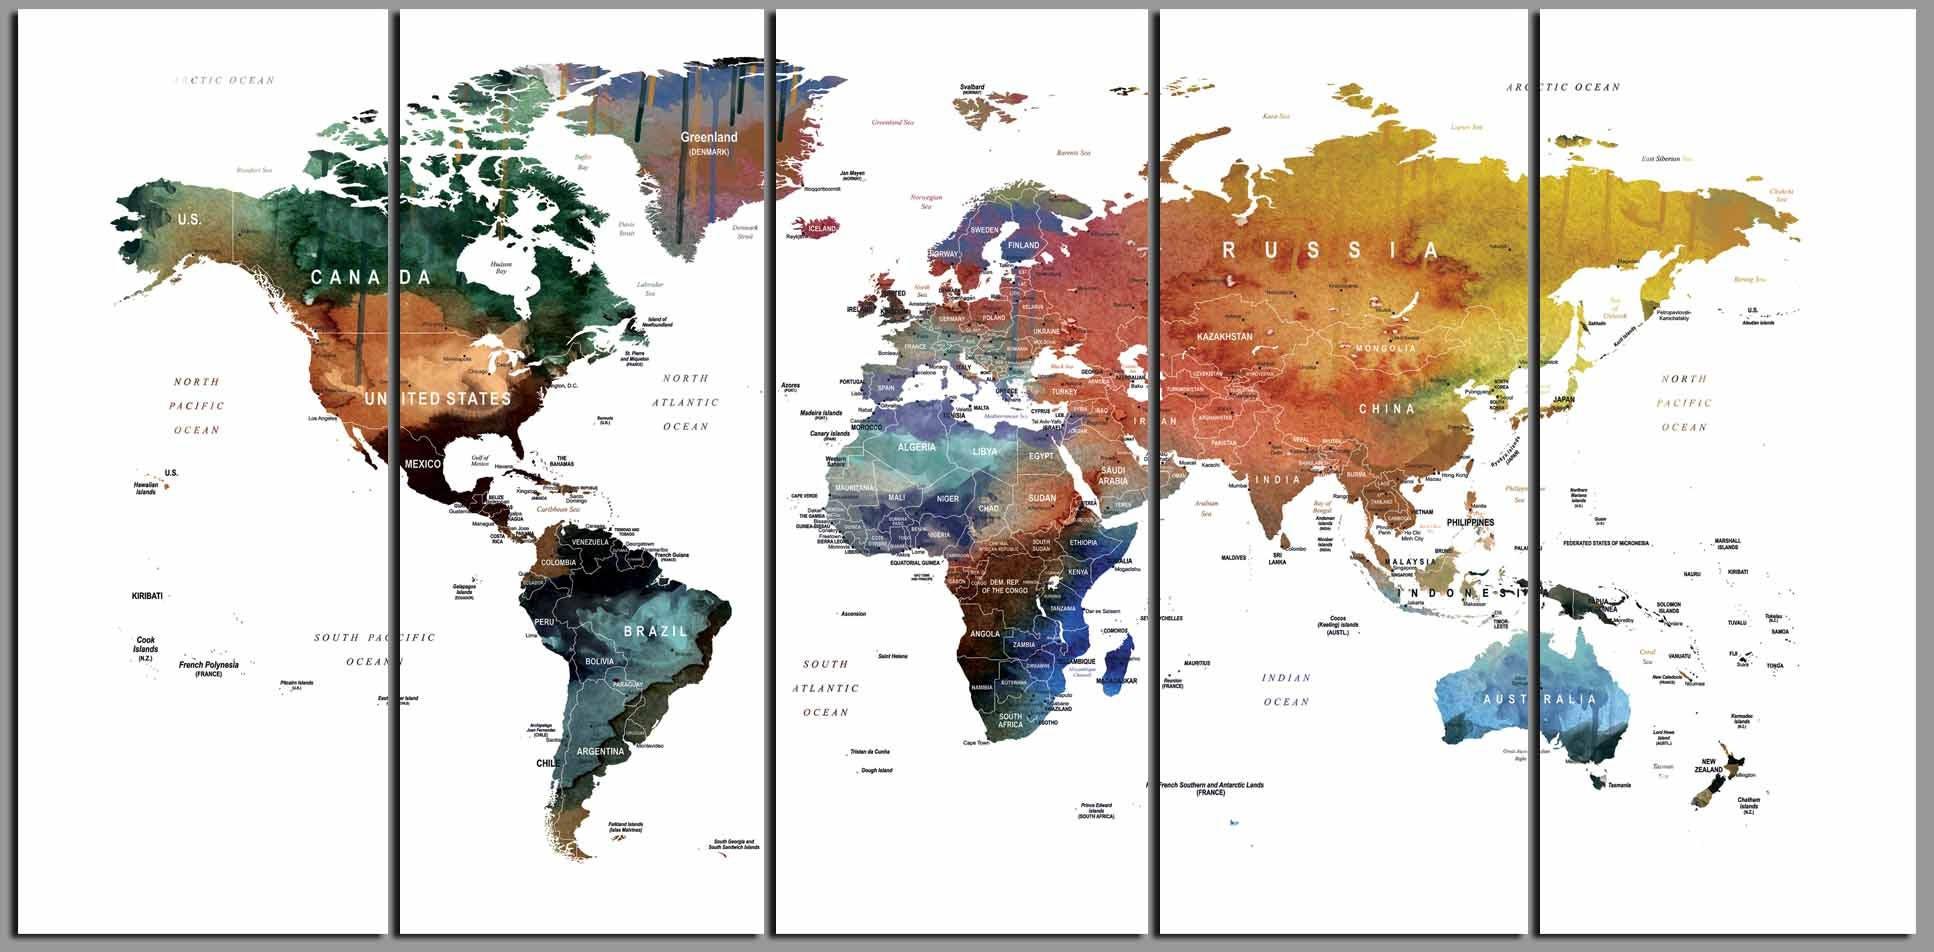 World map canvasworld map wall artworld map watercolorworld map world map canvasworld map wall artworld map watercolorworld map push pinlarge world mapworld map printtravel map large world map art gumiabroncs Choice Image